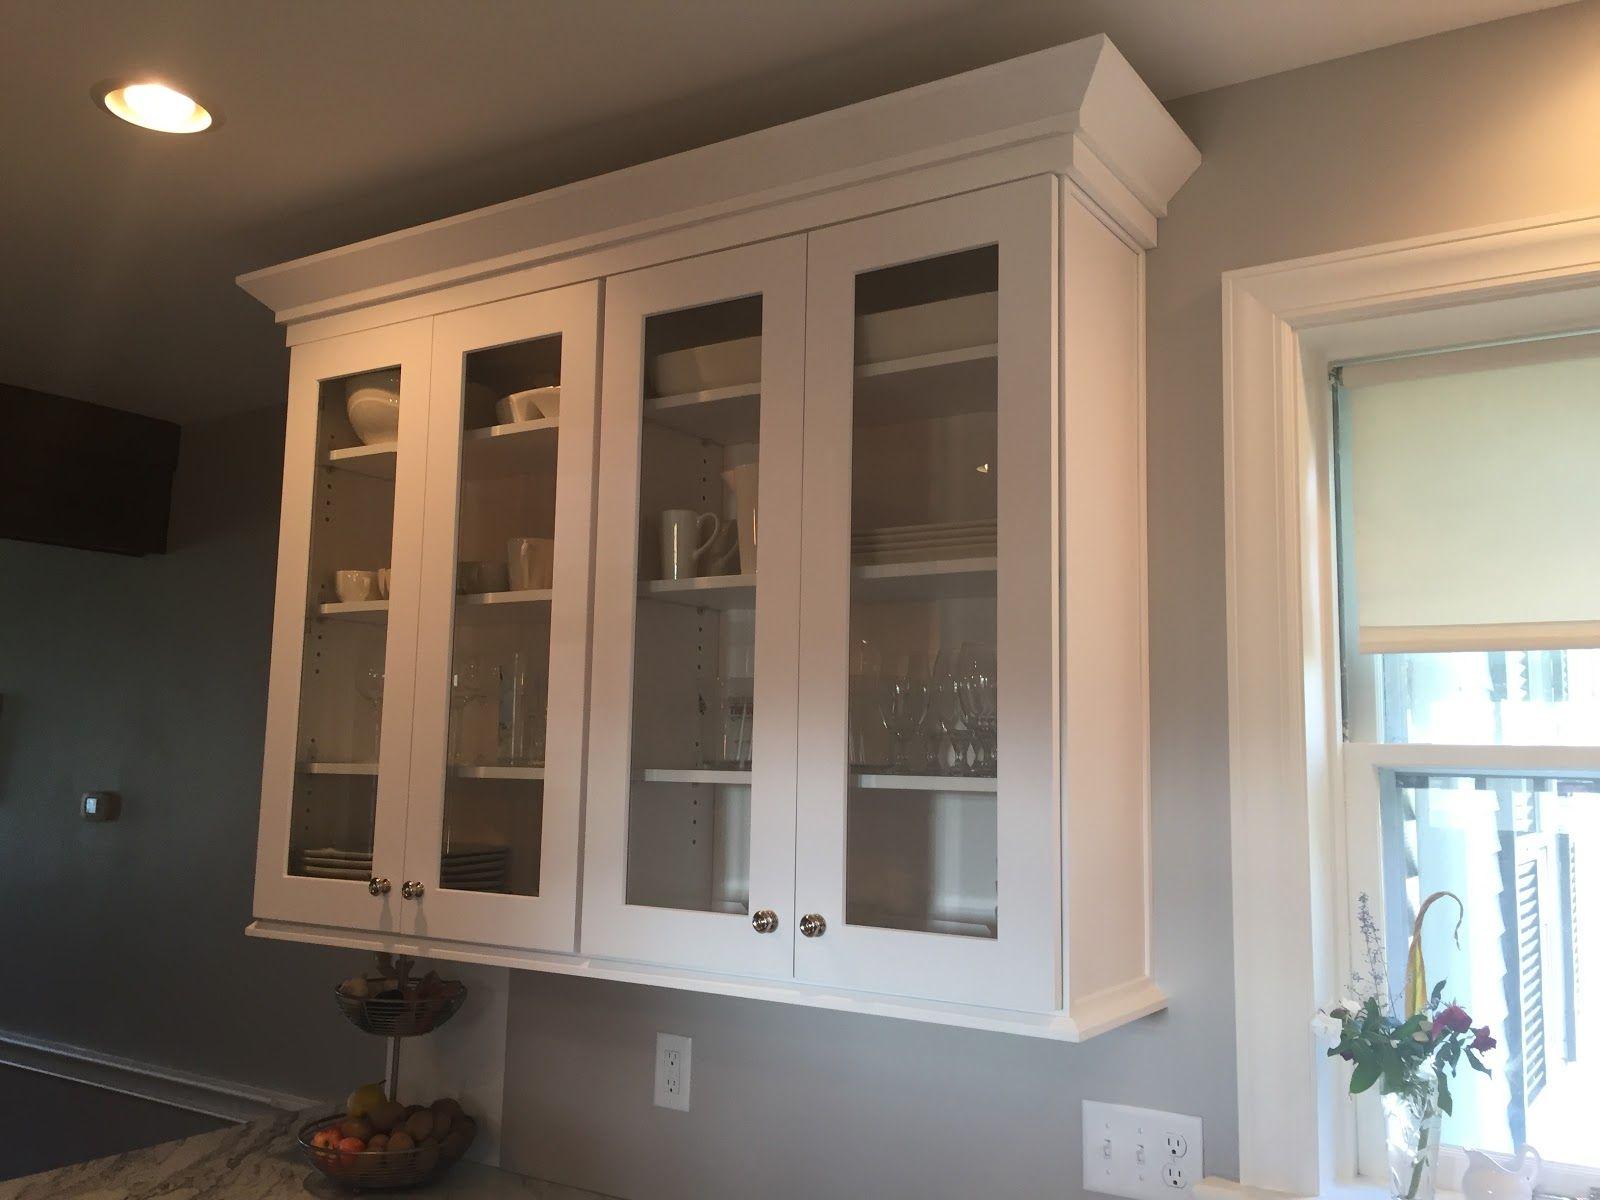 Lily Ann Kitchen Cabinets White Shaker Elite Kitchen Cabinets Remodeling By Lily Ann